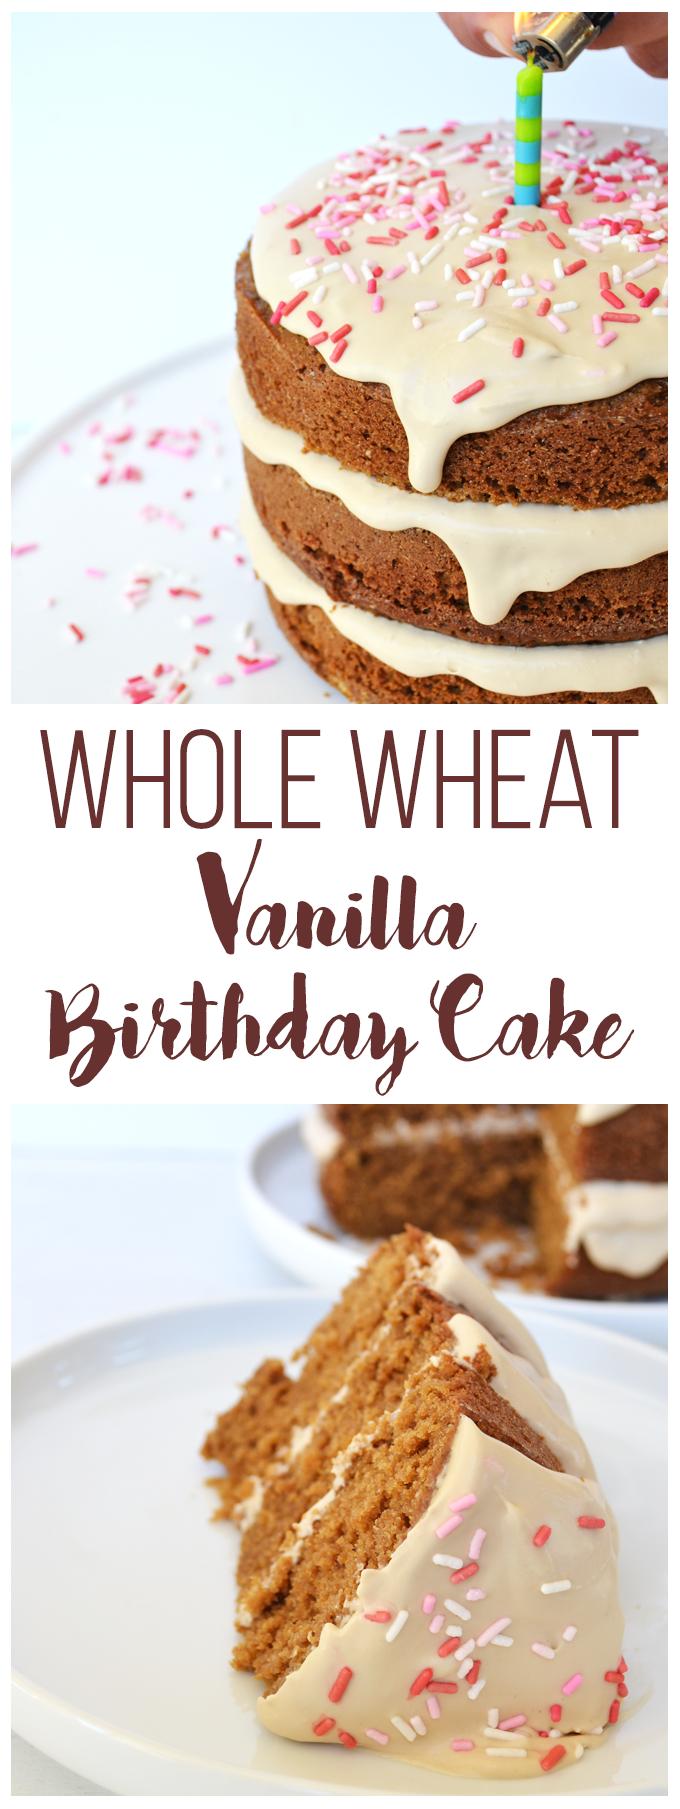 Whole Wheat Vanilla Birthday Cake